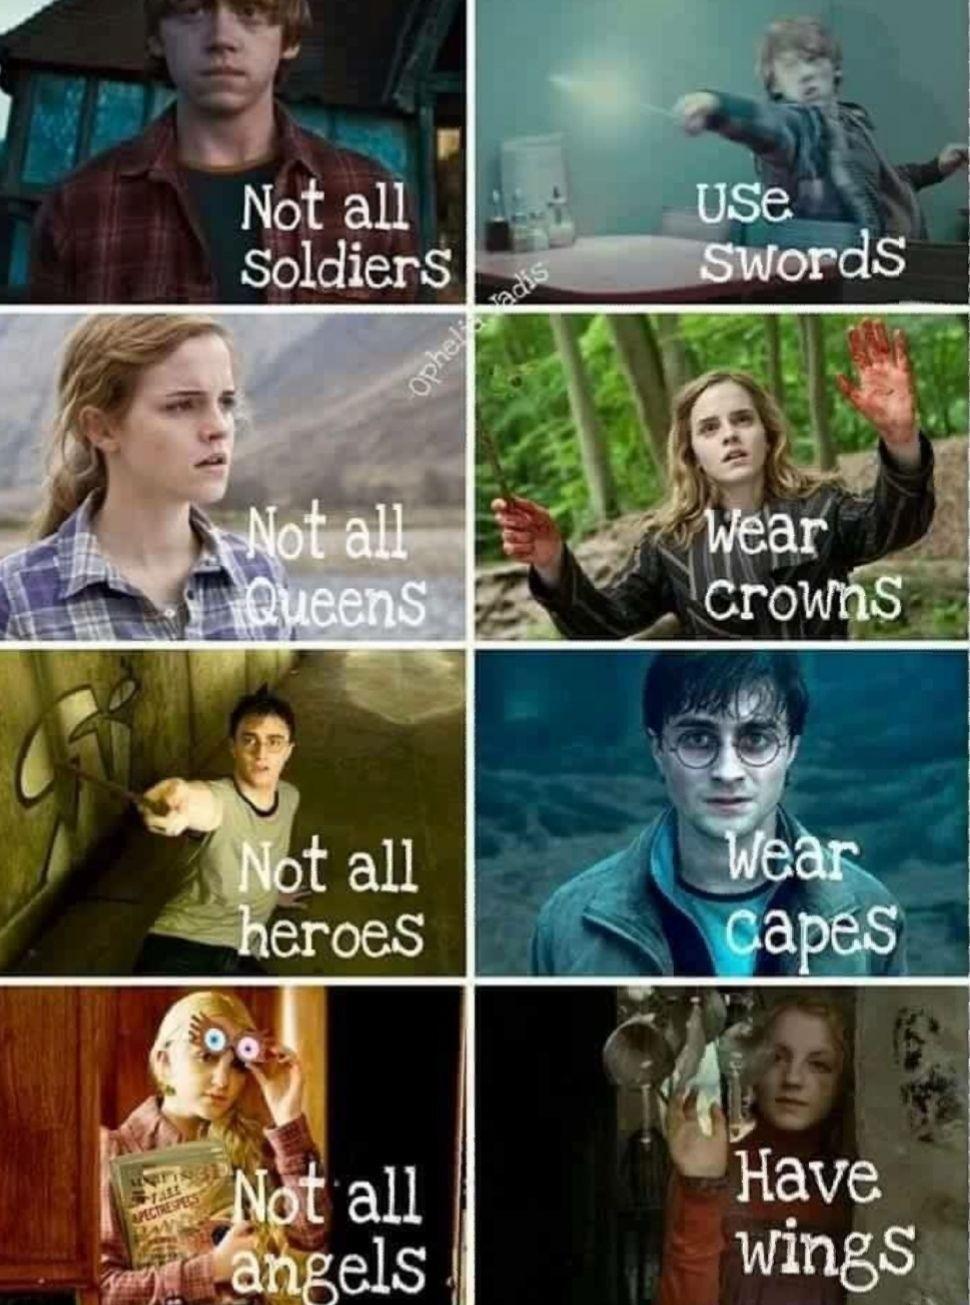 Zur ehren von Harry Potters (geb. 31.7 1980) 39 Geburtstag. #fanfiction Fan-Fiction #amreading #books #wattpad